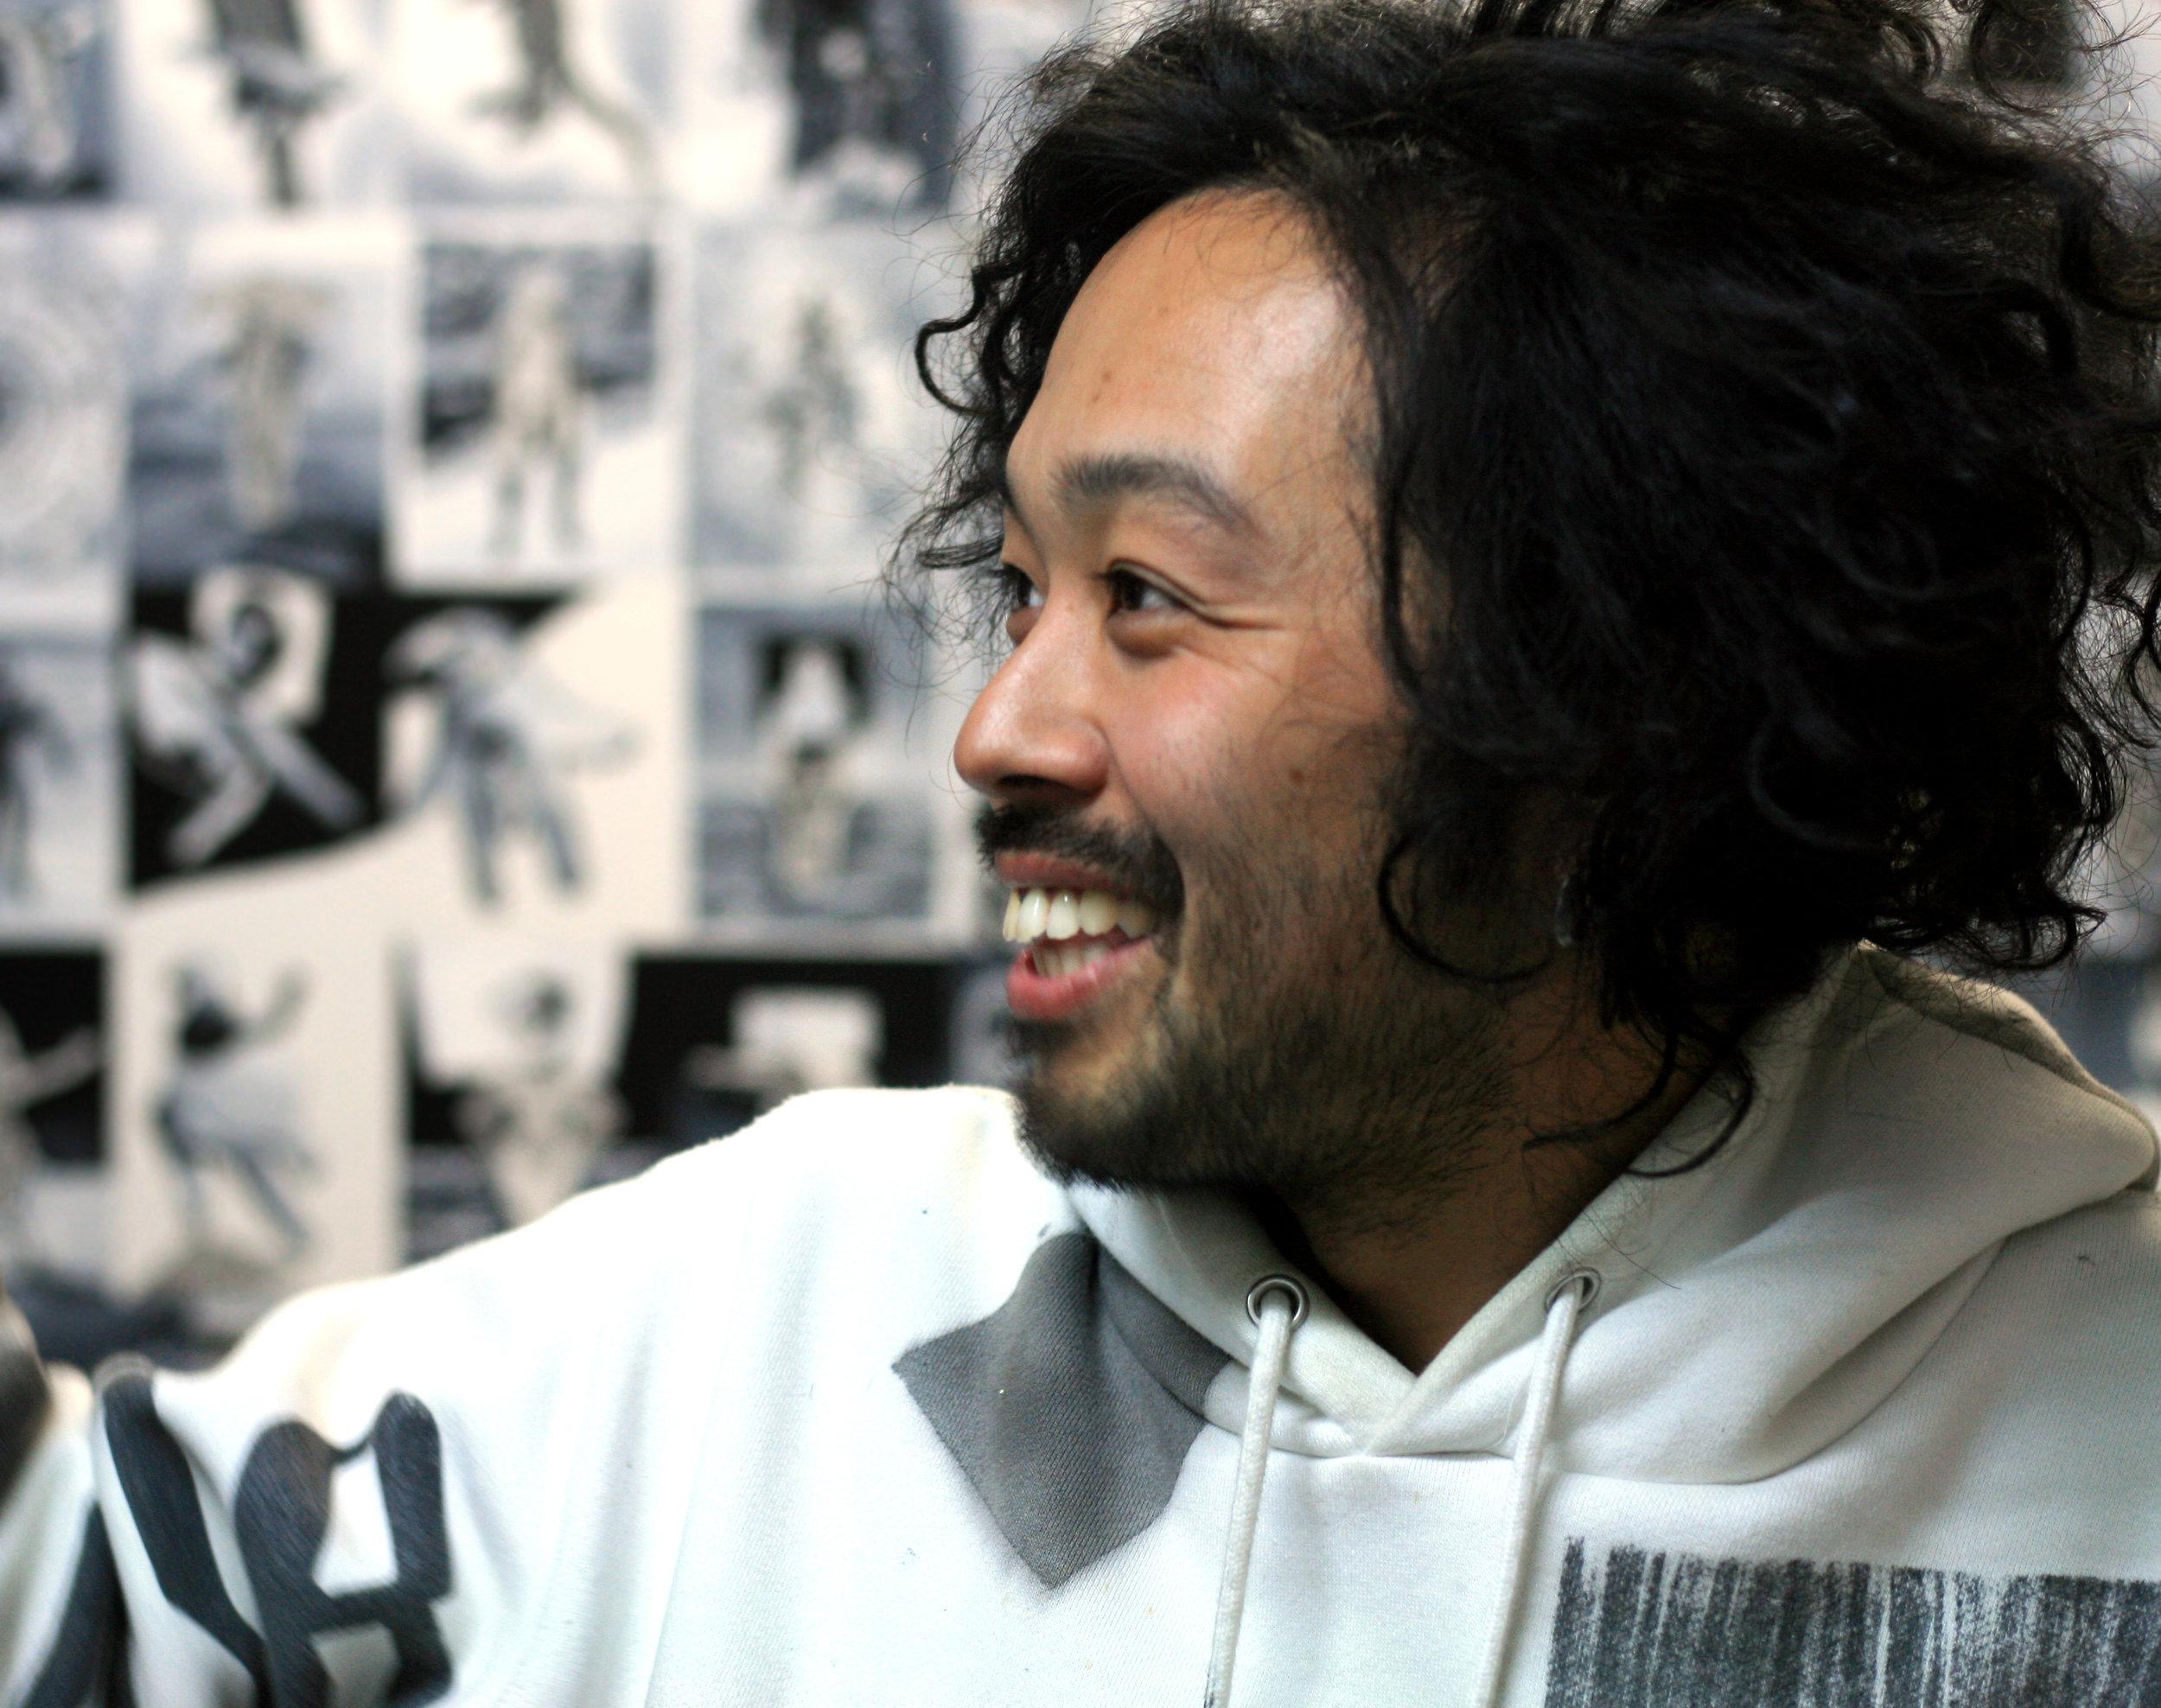 Daijiro Smiling